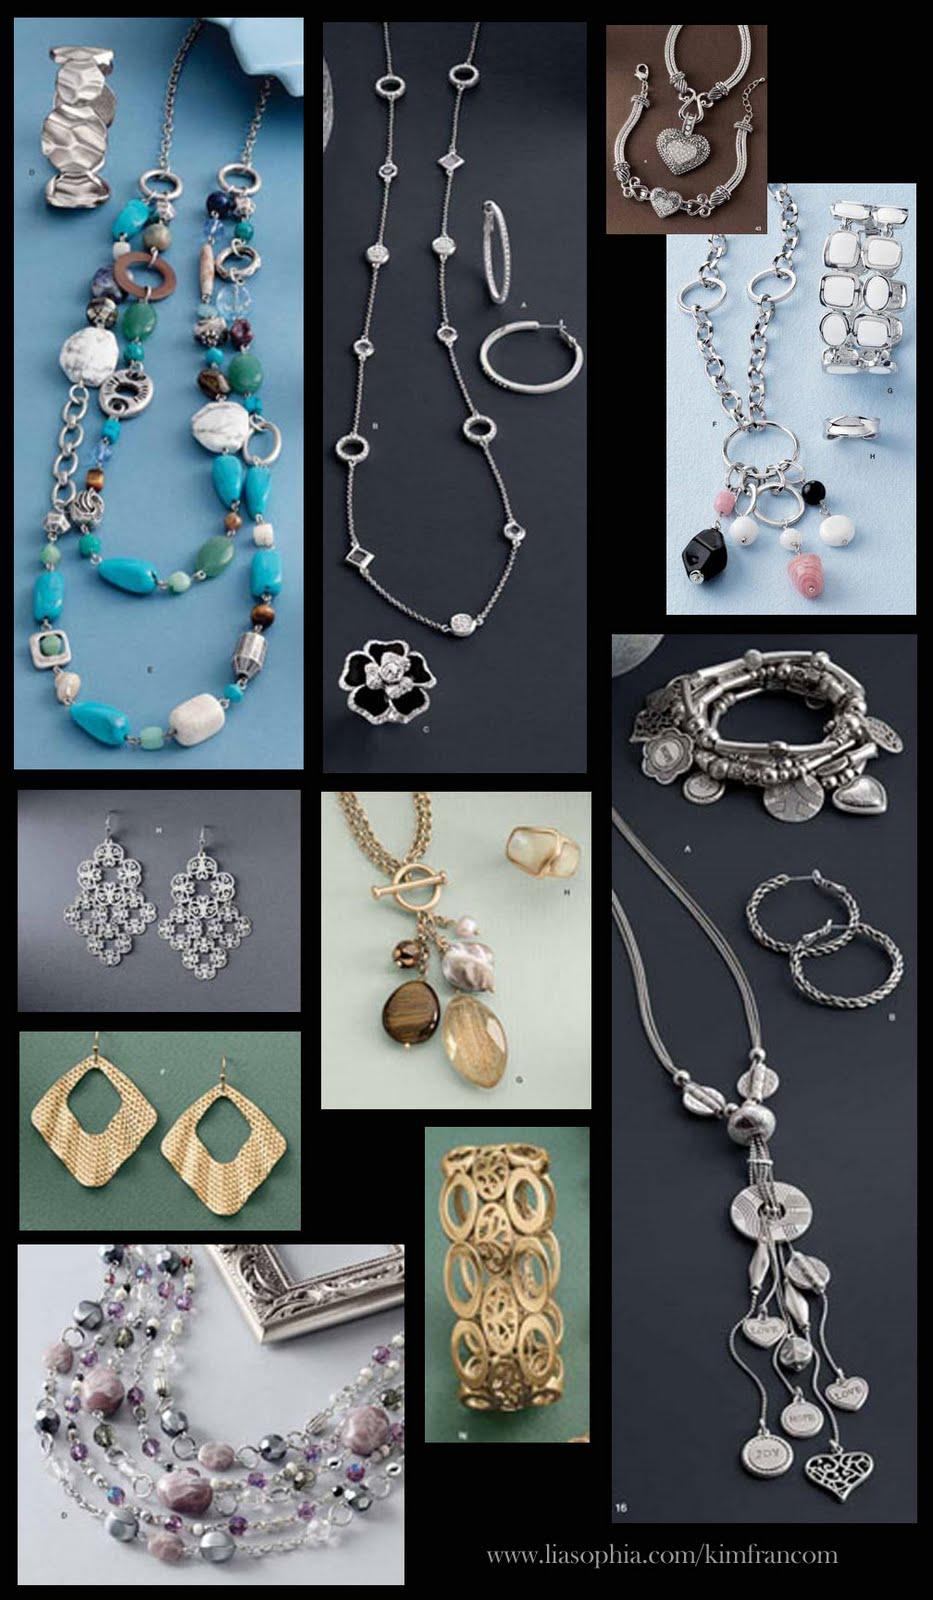 The Francom S Lia Sophia Jewelry Spring